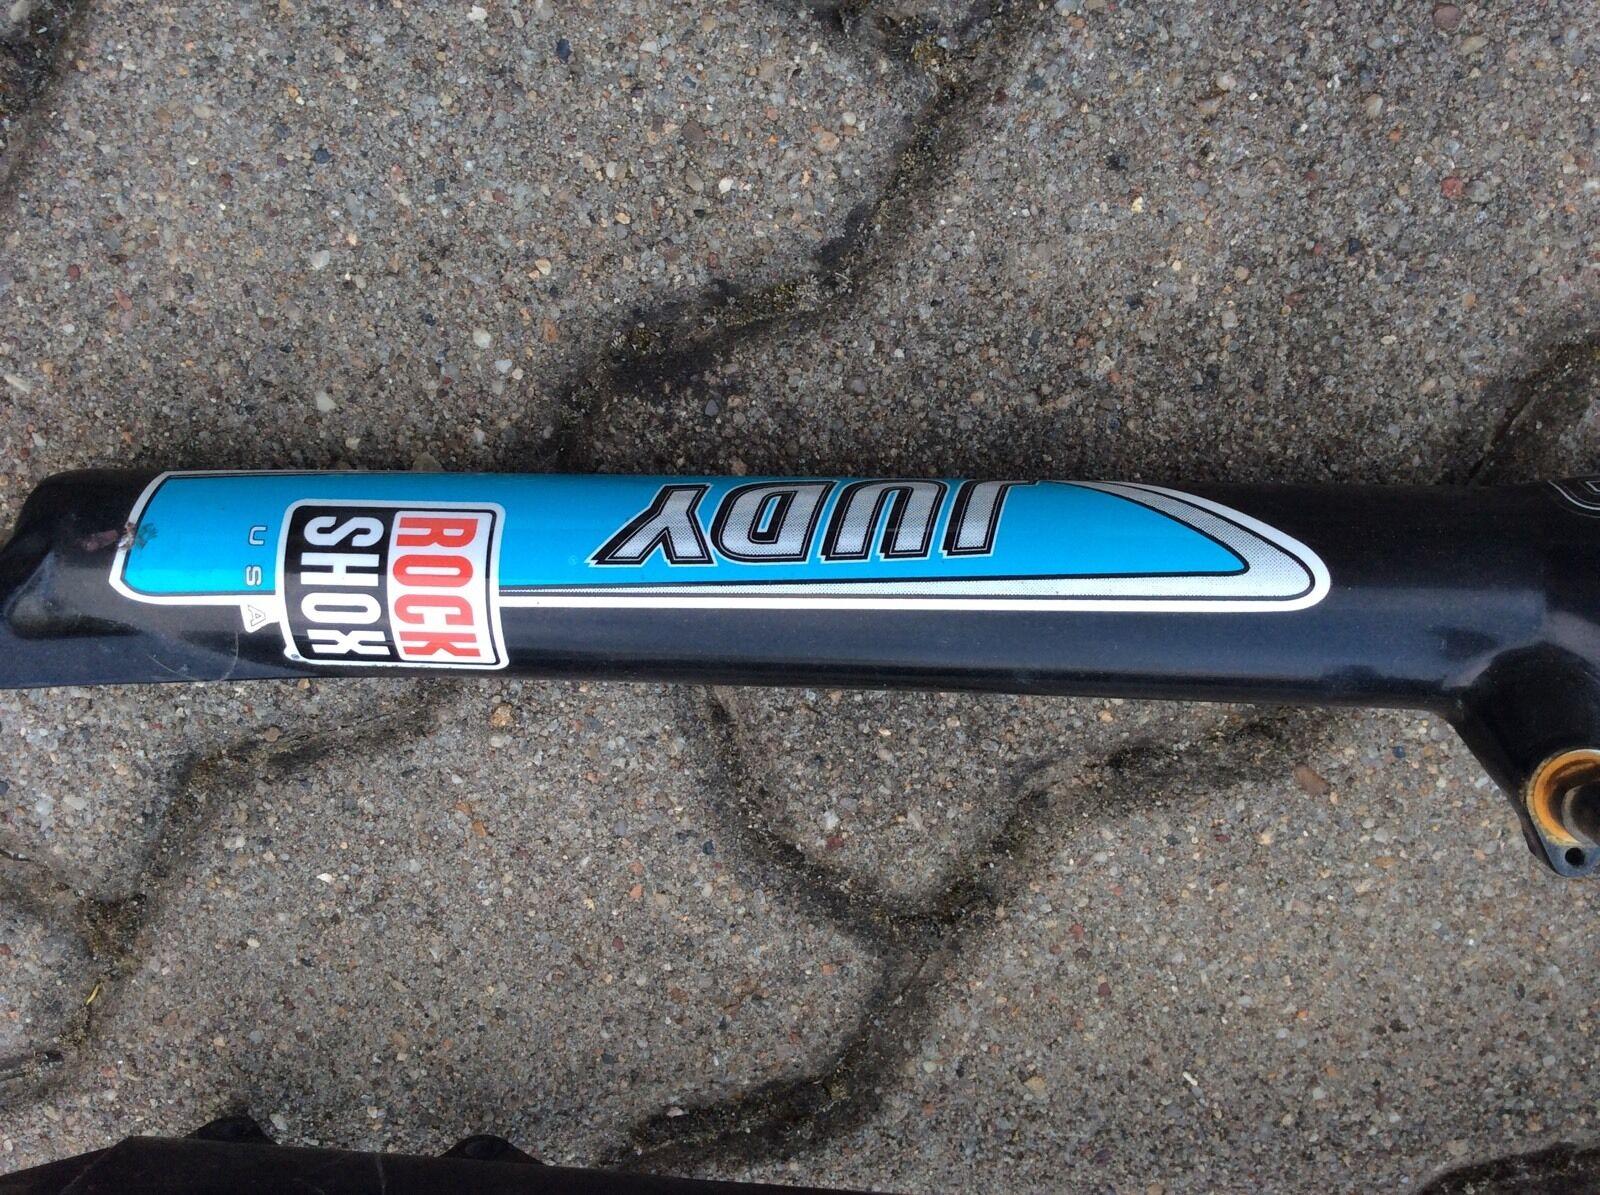 Retro culto FORCELLA RockShox Judy XC 26 FORCELLA gambale 1 18 MAX. 500km